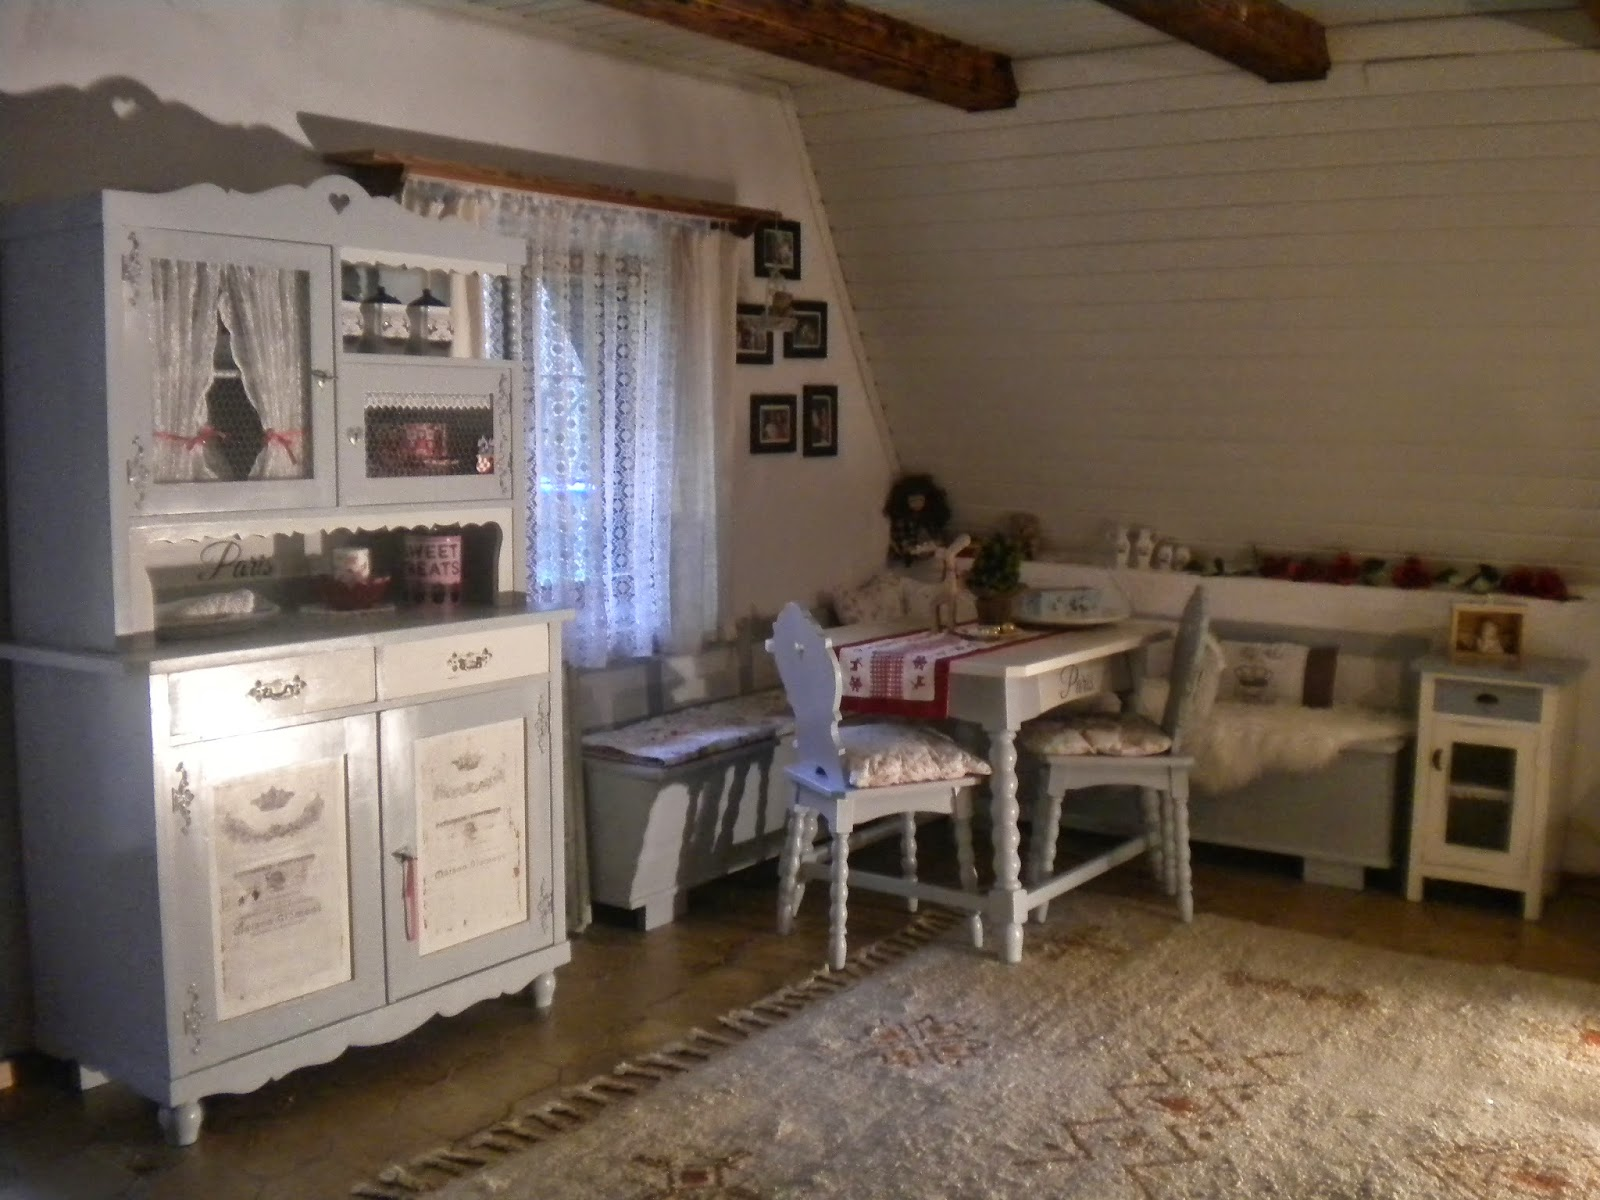 shabby chic by frances esszimmer vorher nachher. Black Bedroom Furniture Sets. Home Design Ideas